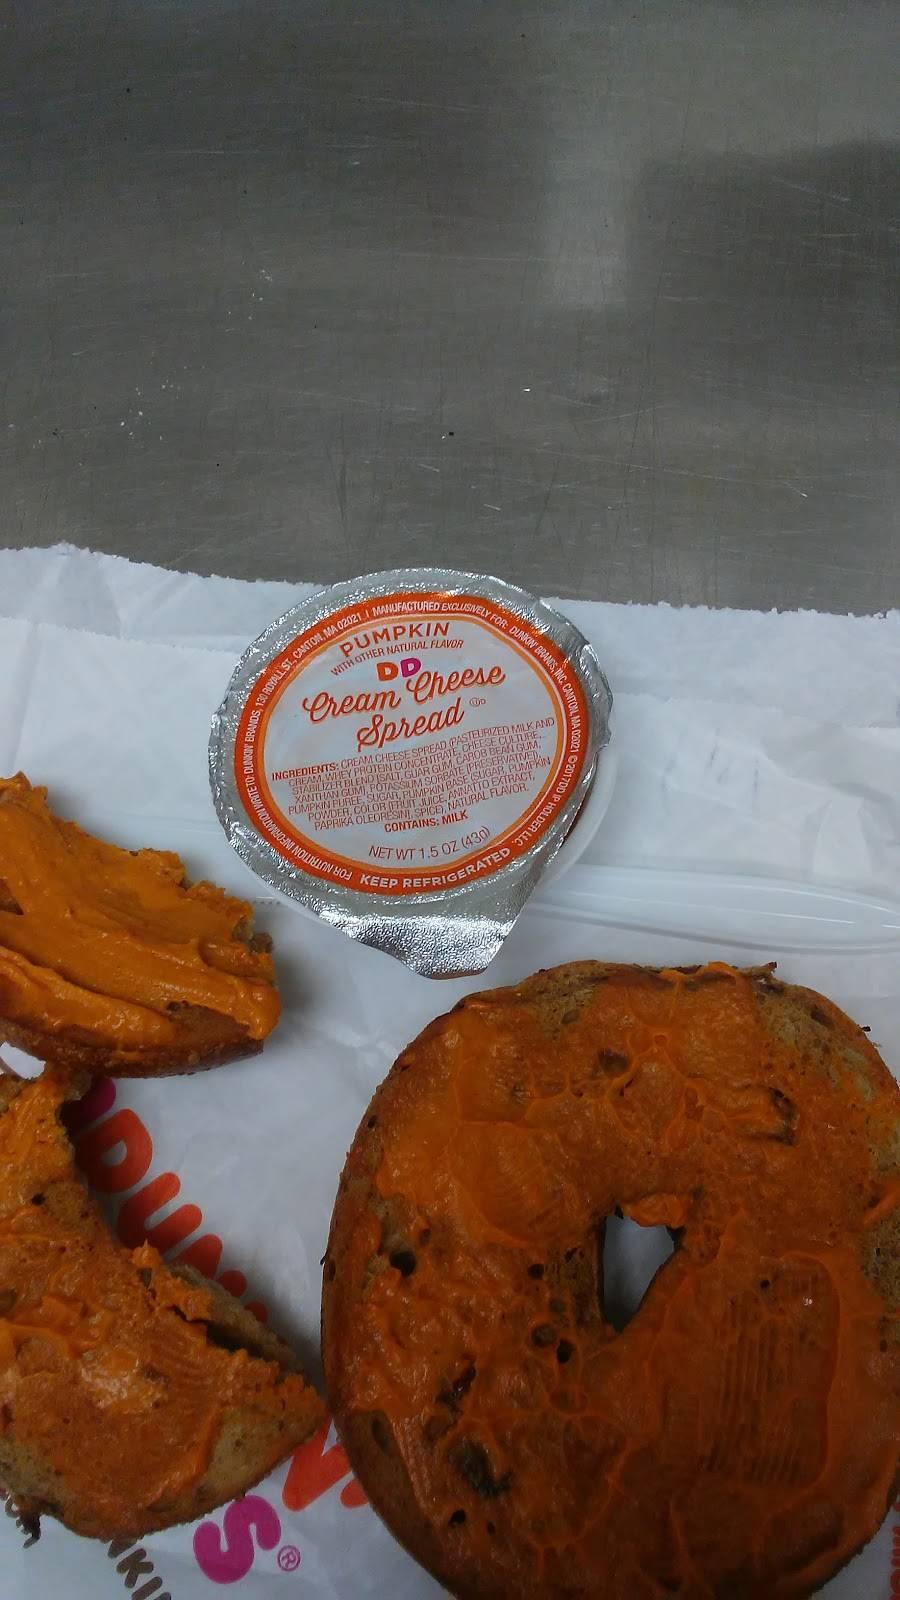 Dunkin | bakery | 29 Franklin St, Wrentham, MA 02093, USA | 5083849801 OR +1 508-384-9801